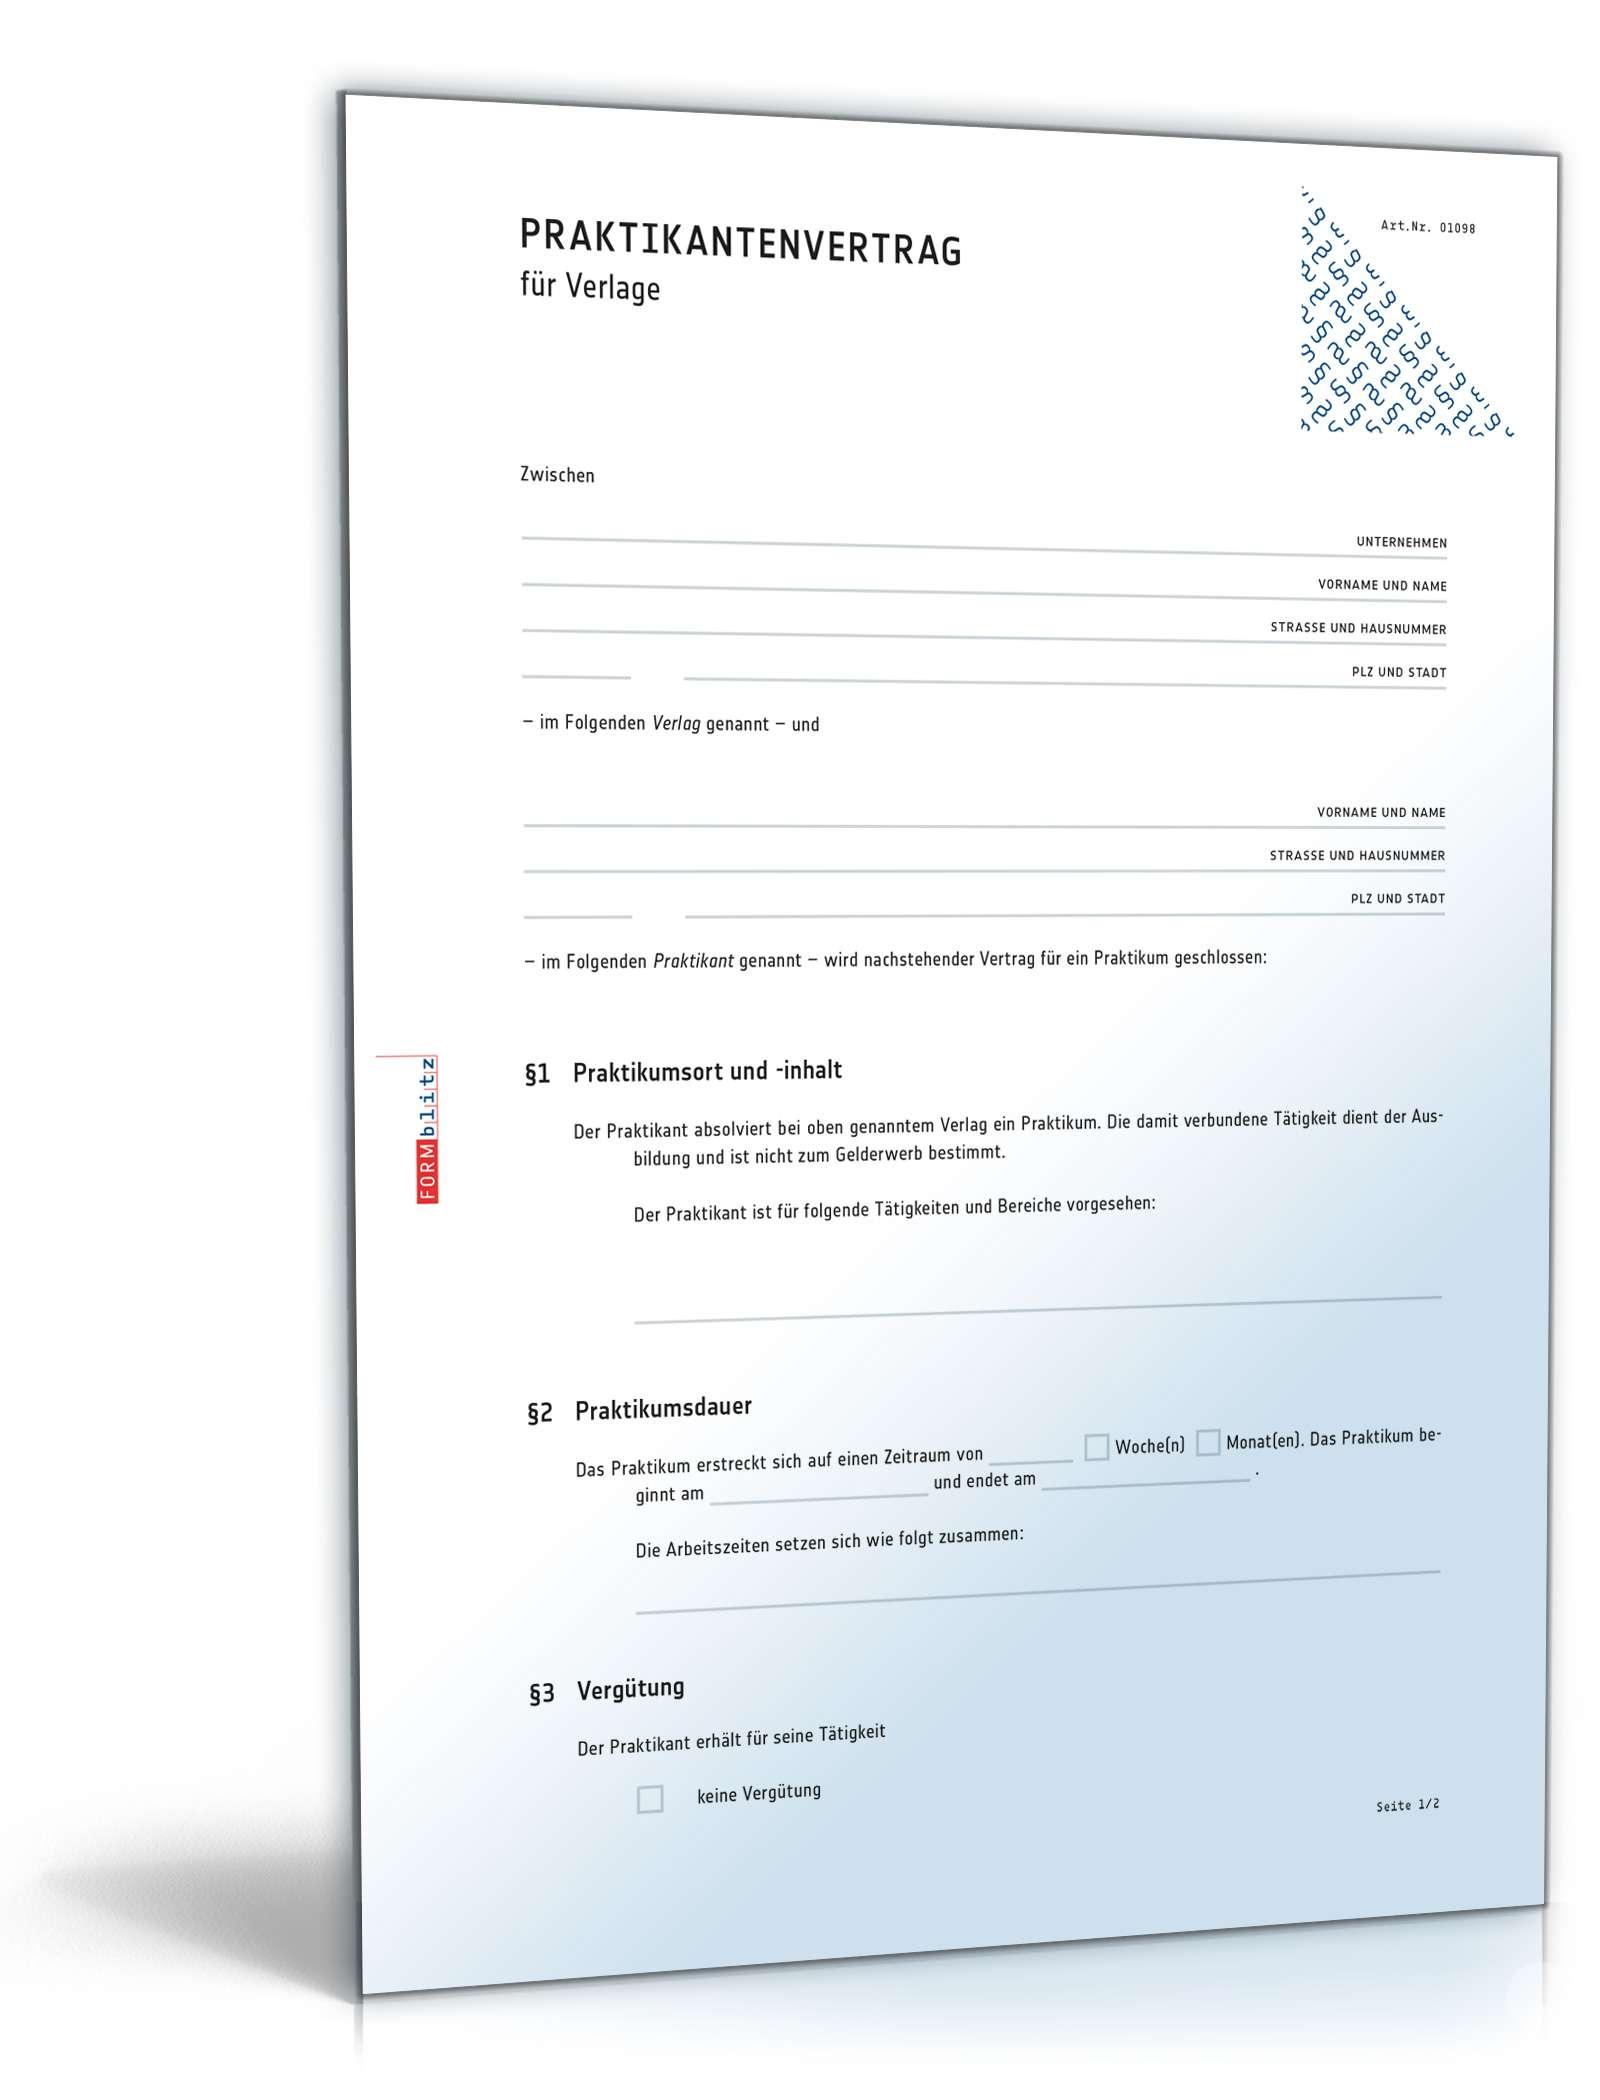 Praktikantenvertrag Verlag Muster Zum Download